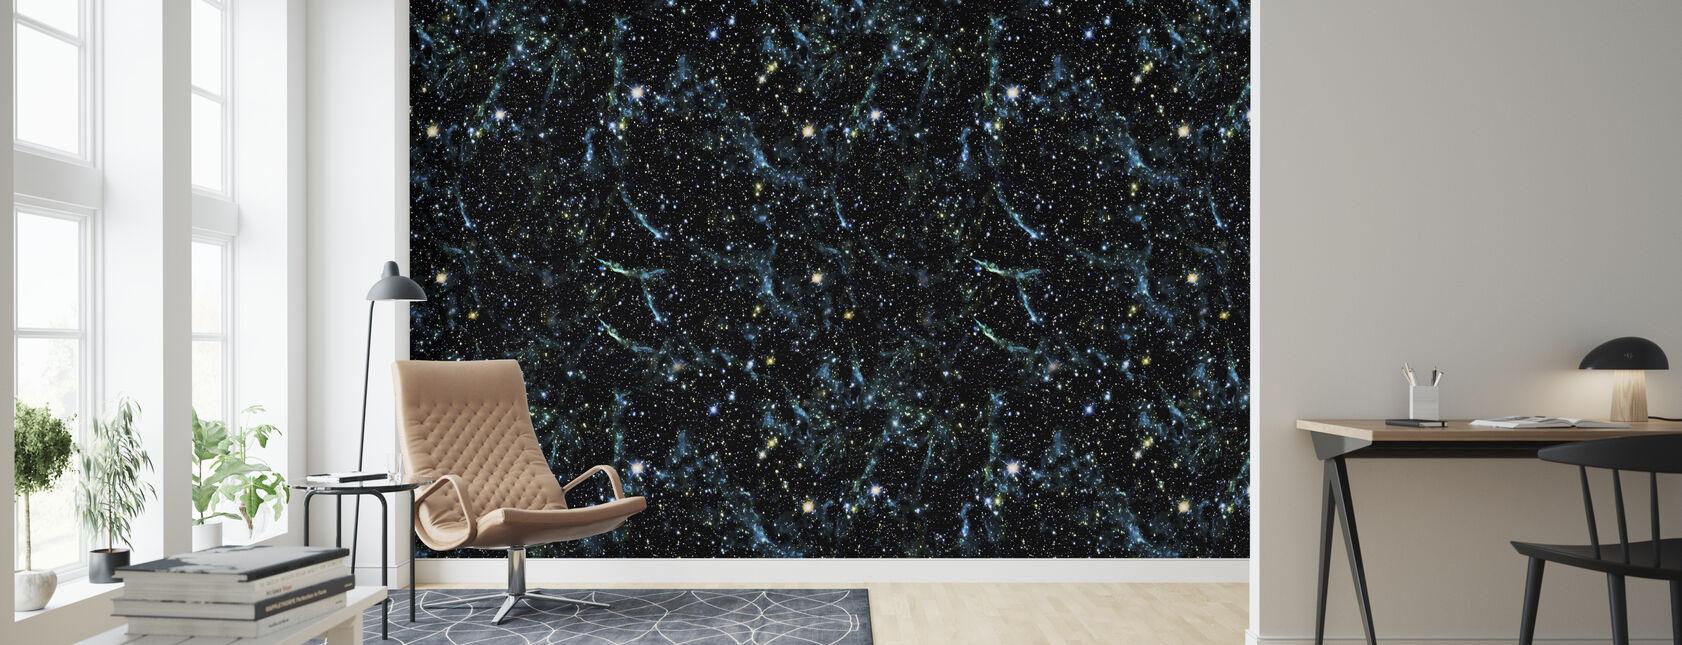 Astronomie & espace